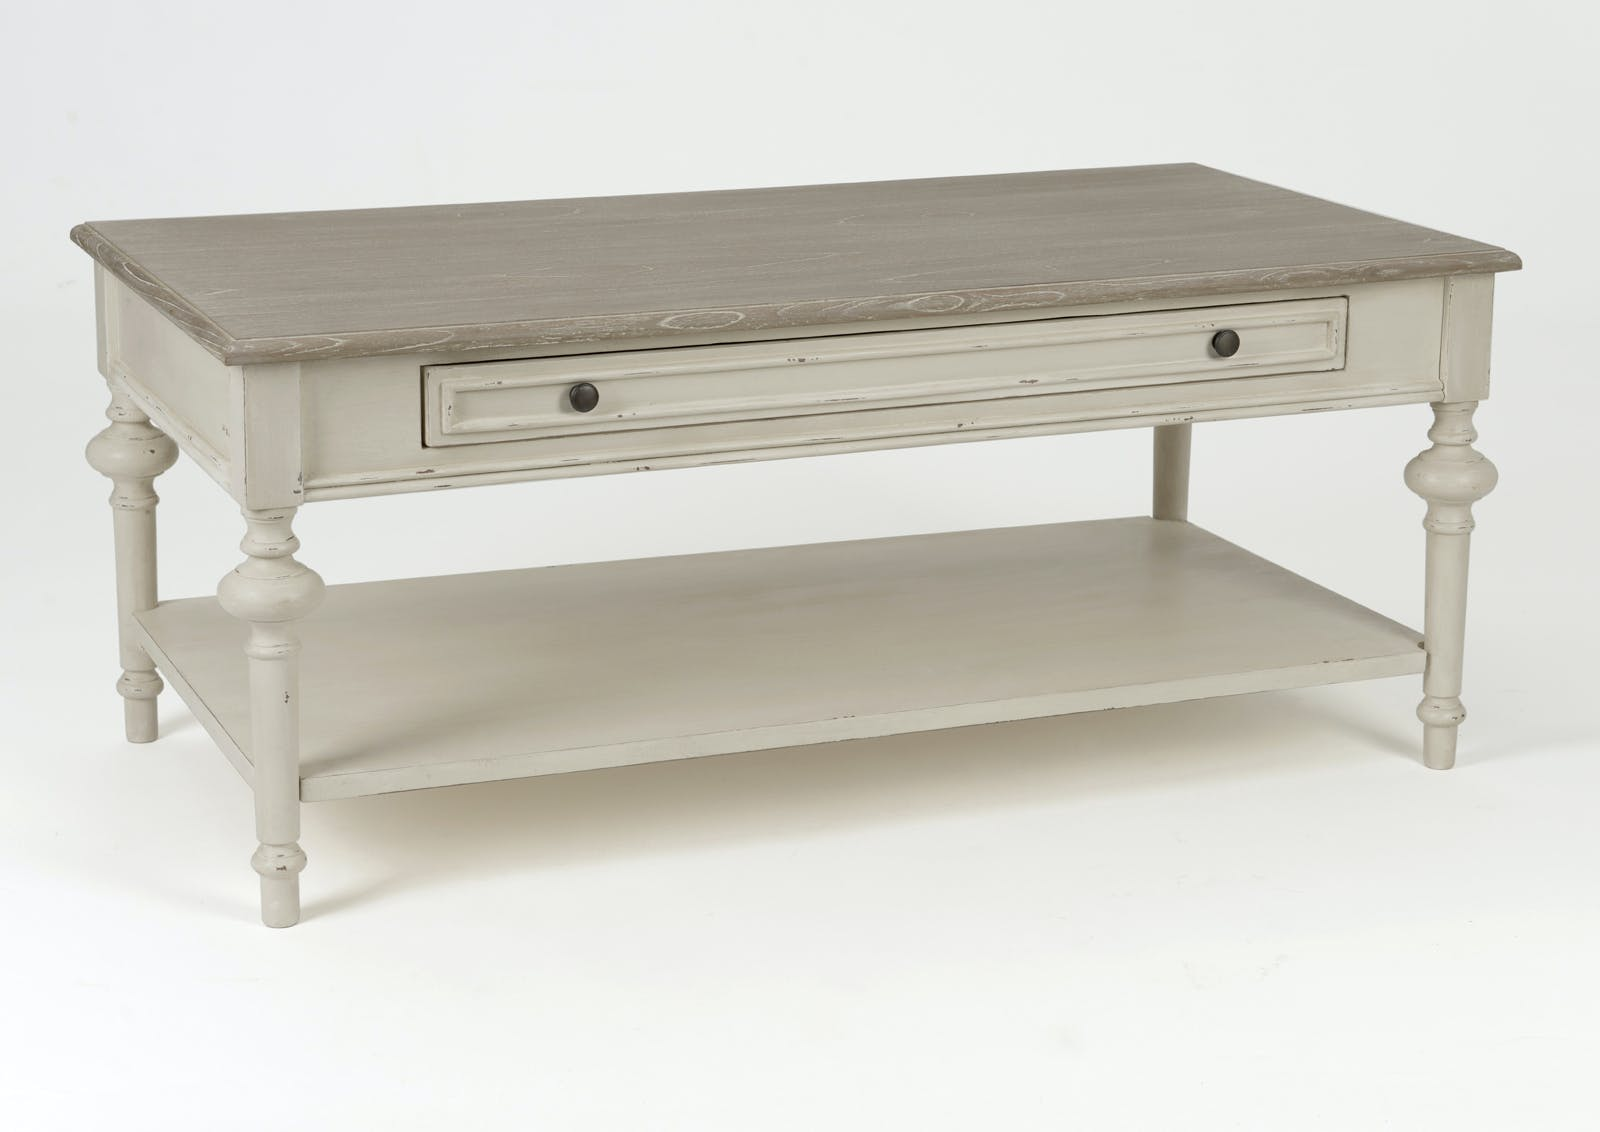 Table basse salon bois blanc vieilli 1 tiroir LEGENDE L120xP60xH50 AMADEUS